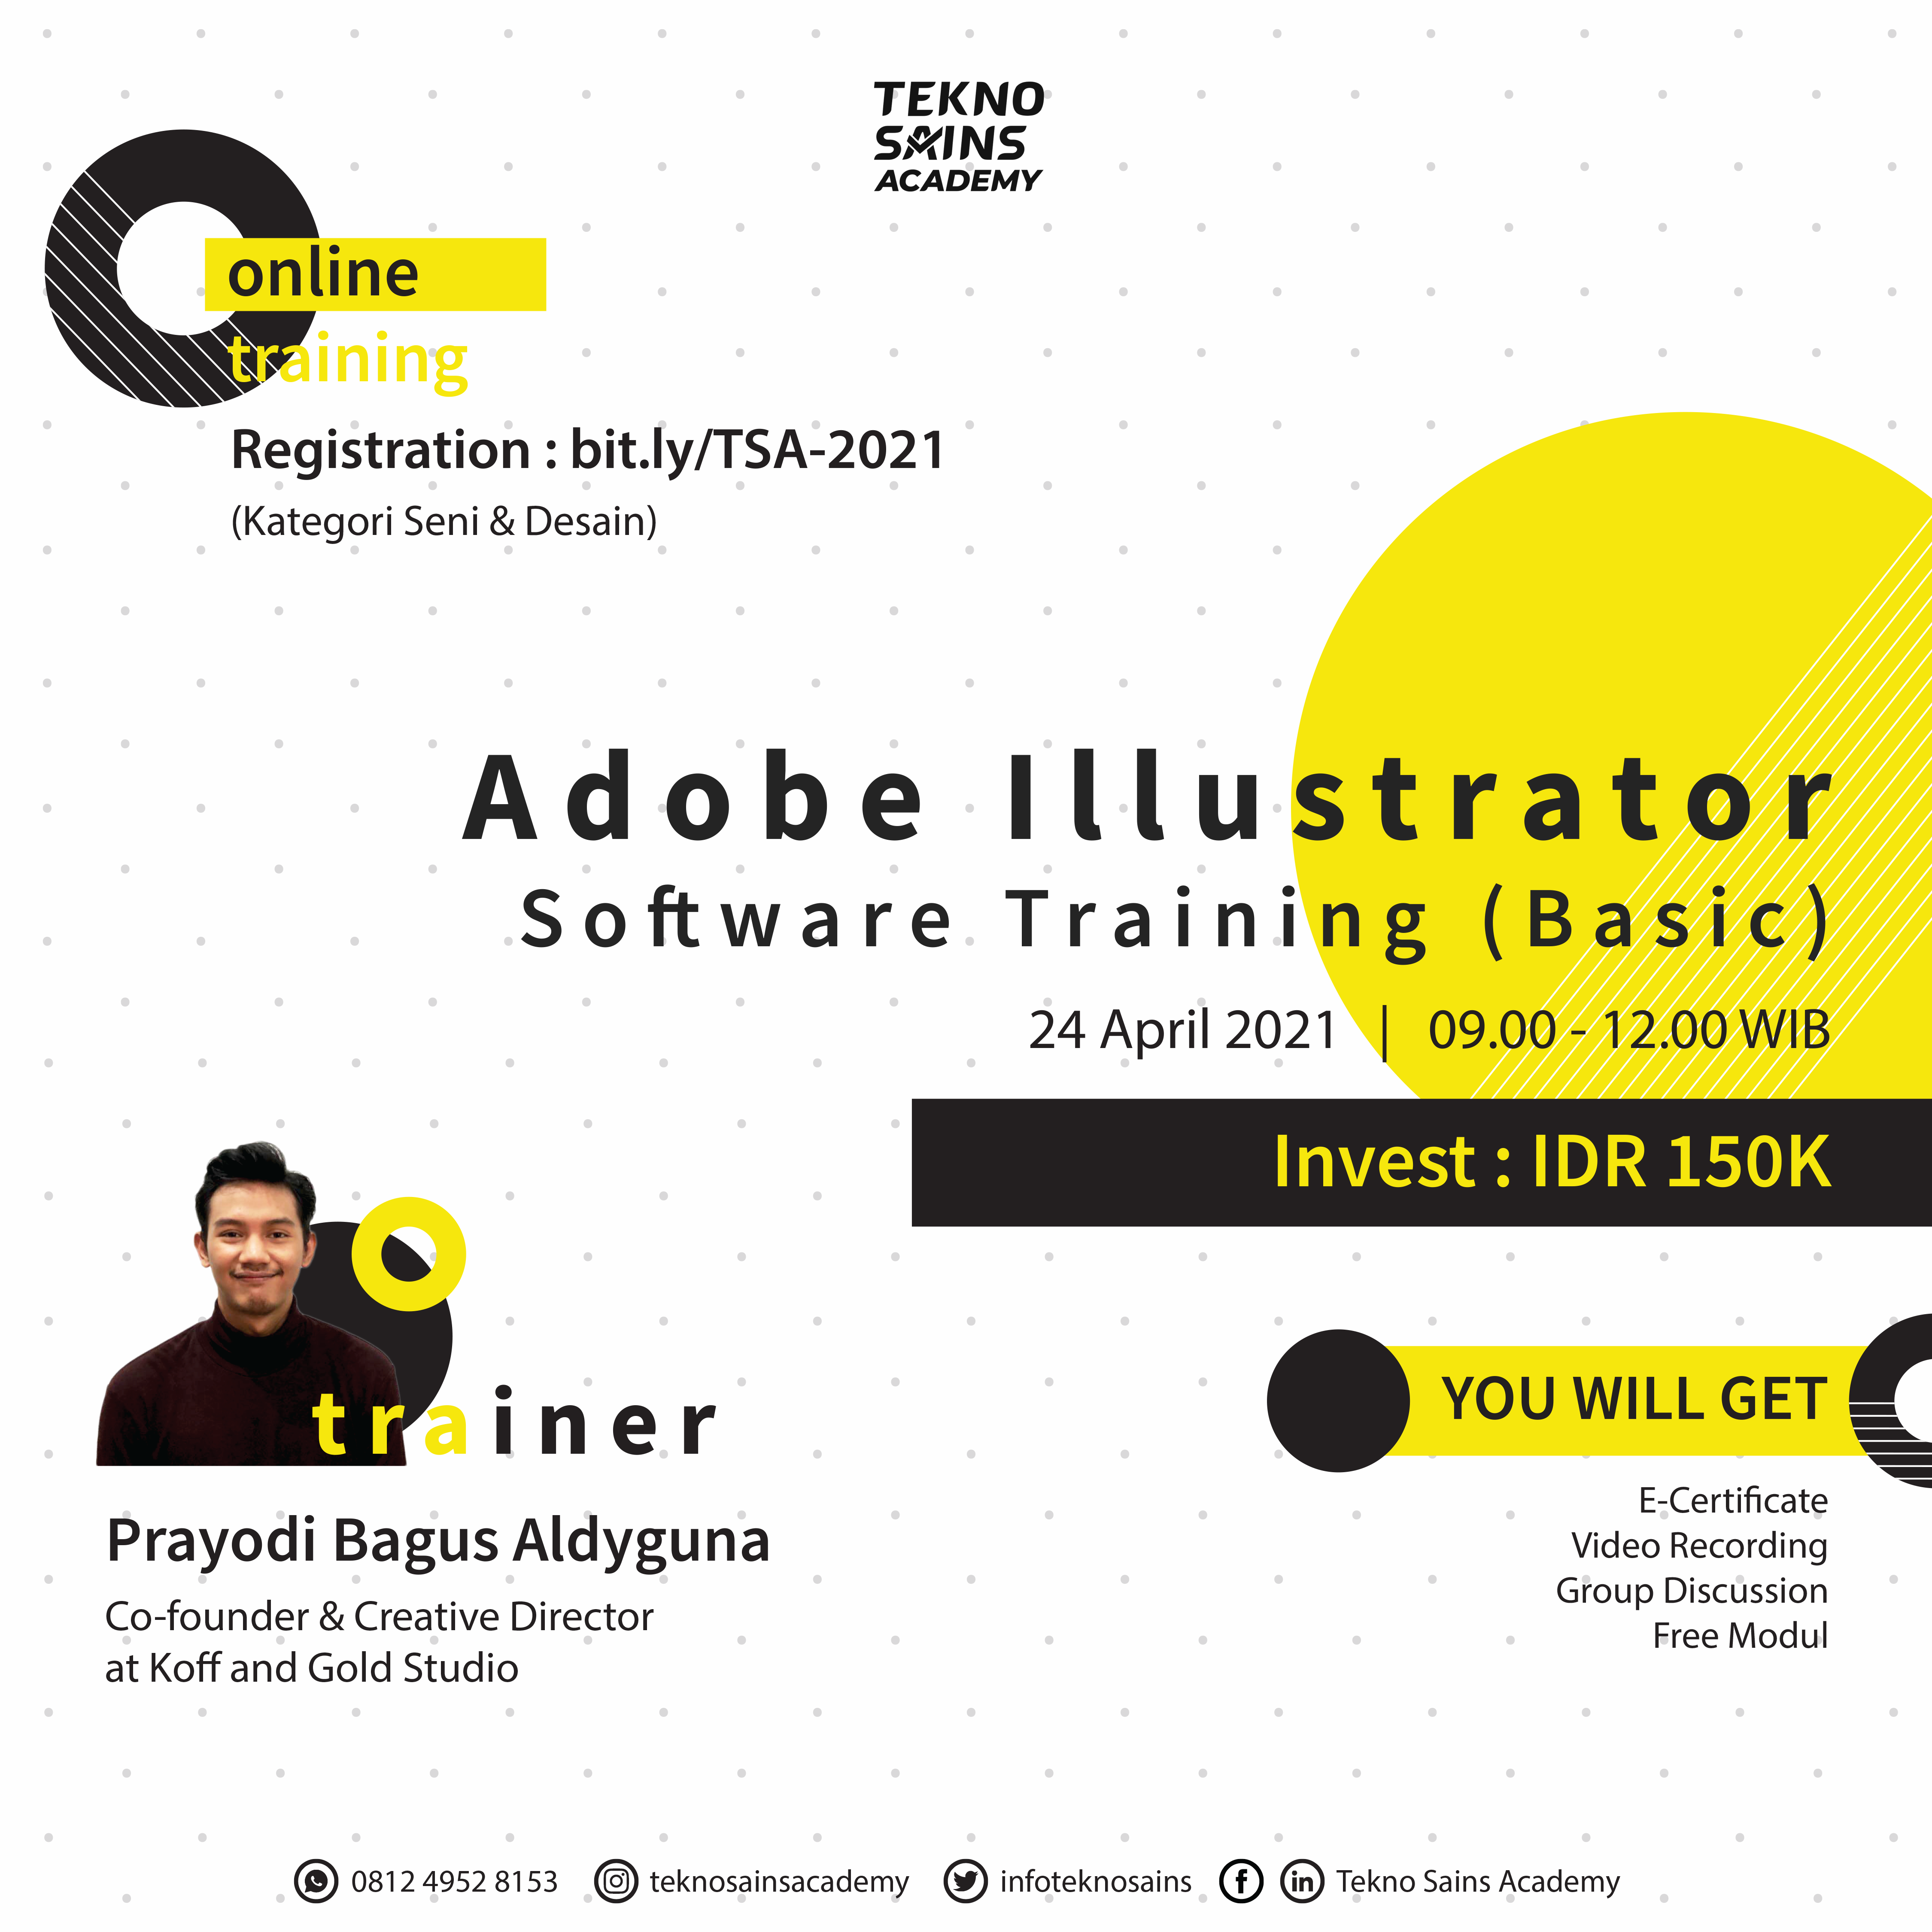 20210322-00 - Flyer Illustrator 24 April 1